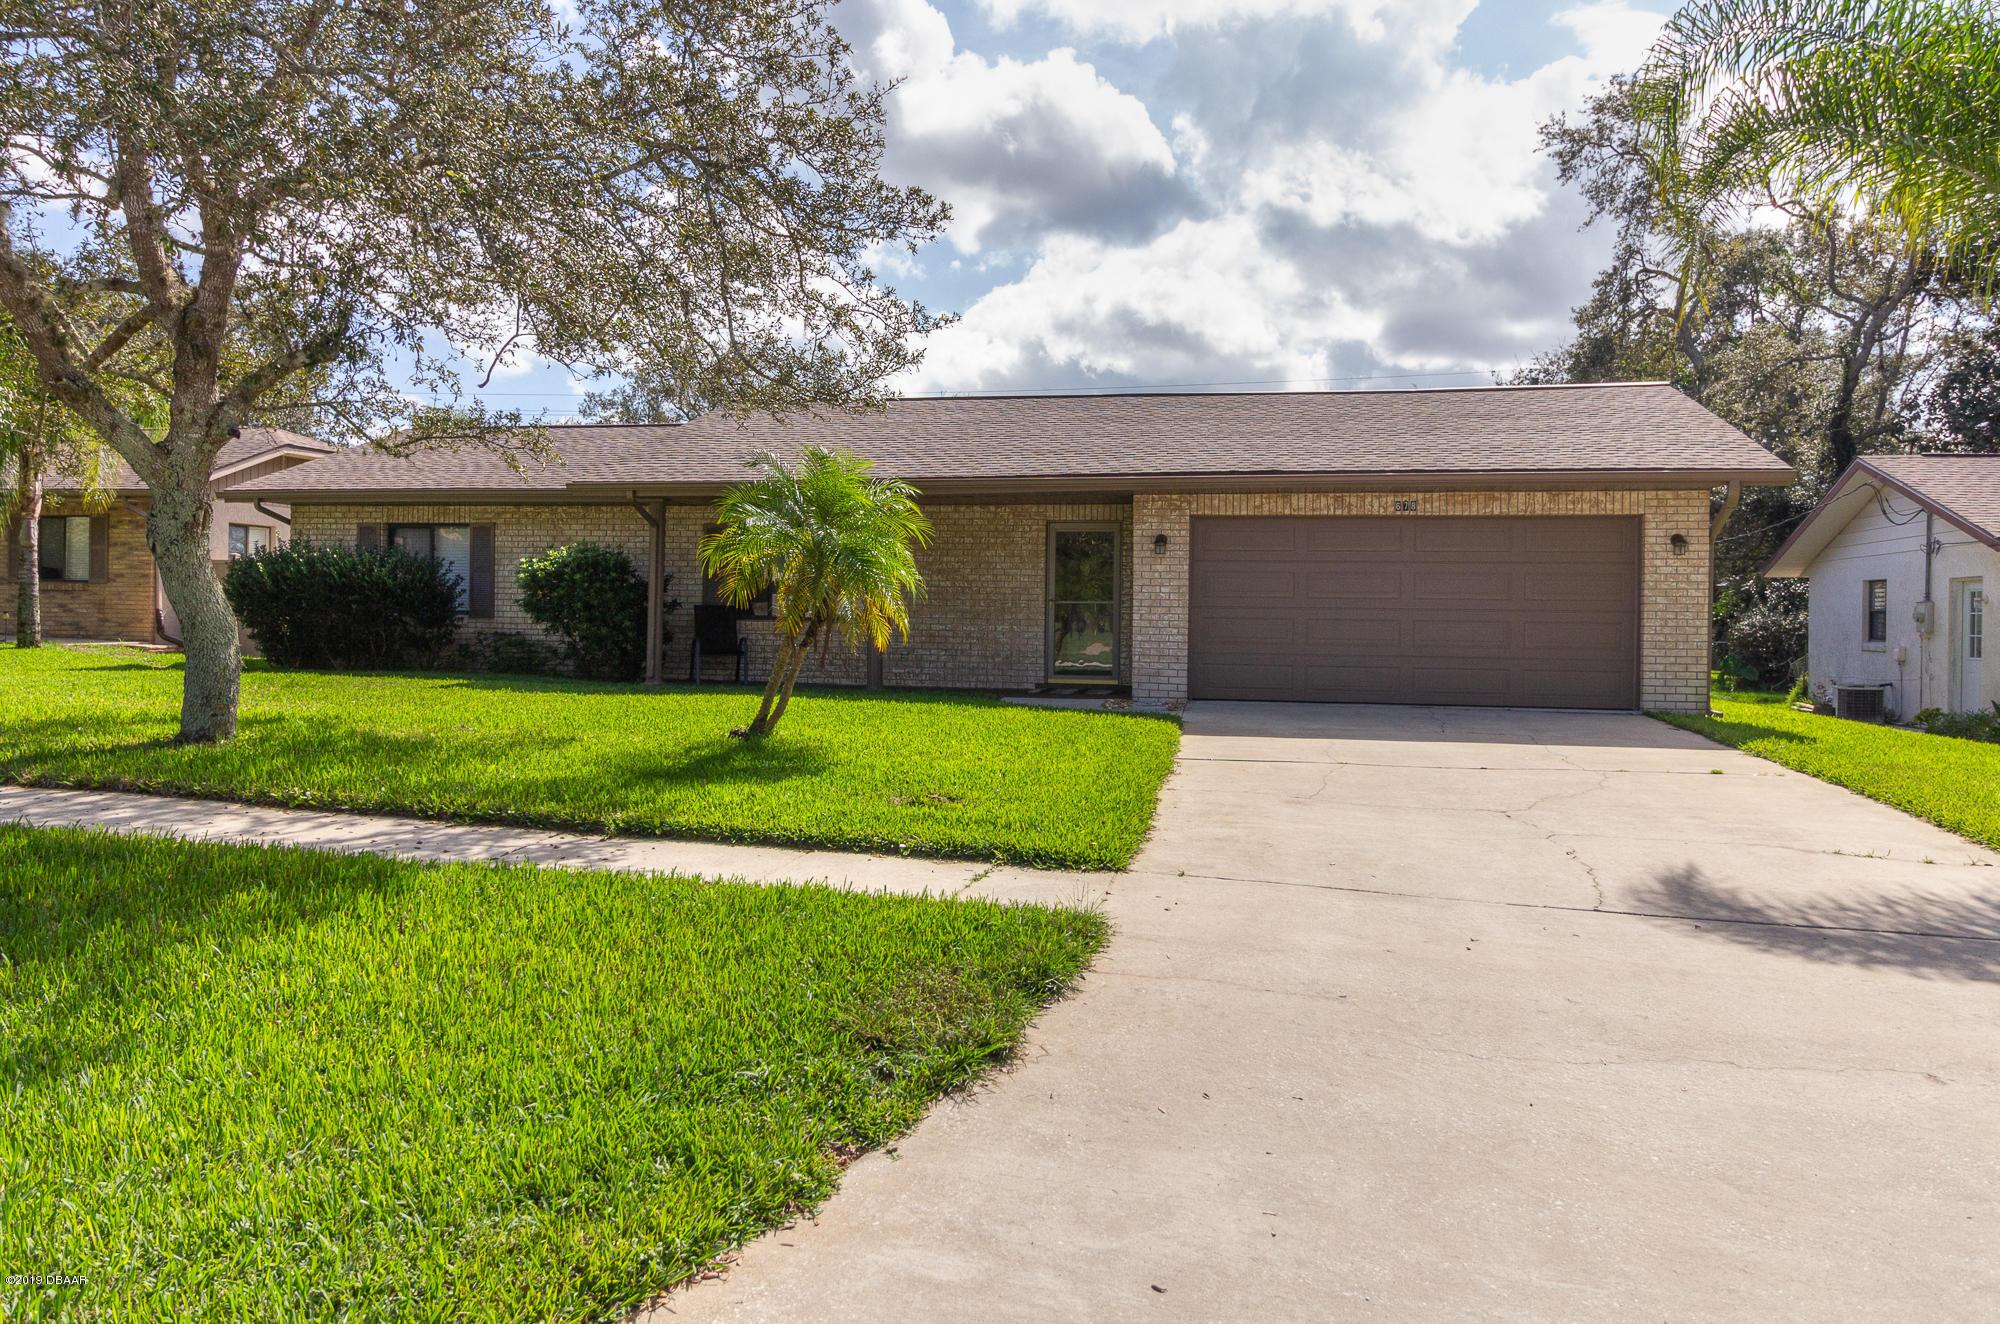 Photo of 678 Branch Drive, Port Orange, FL 32127